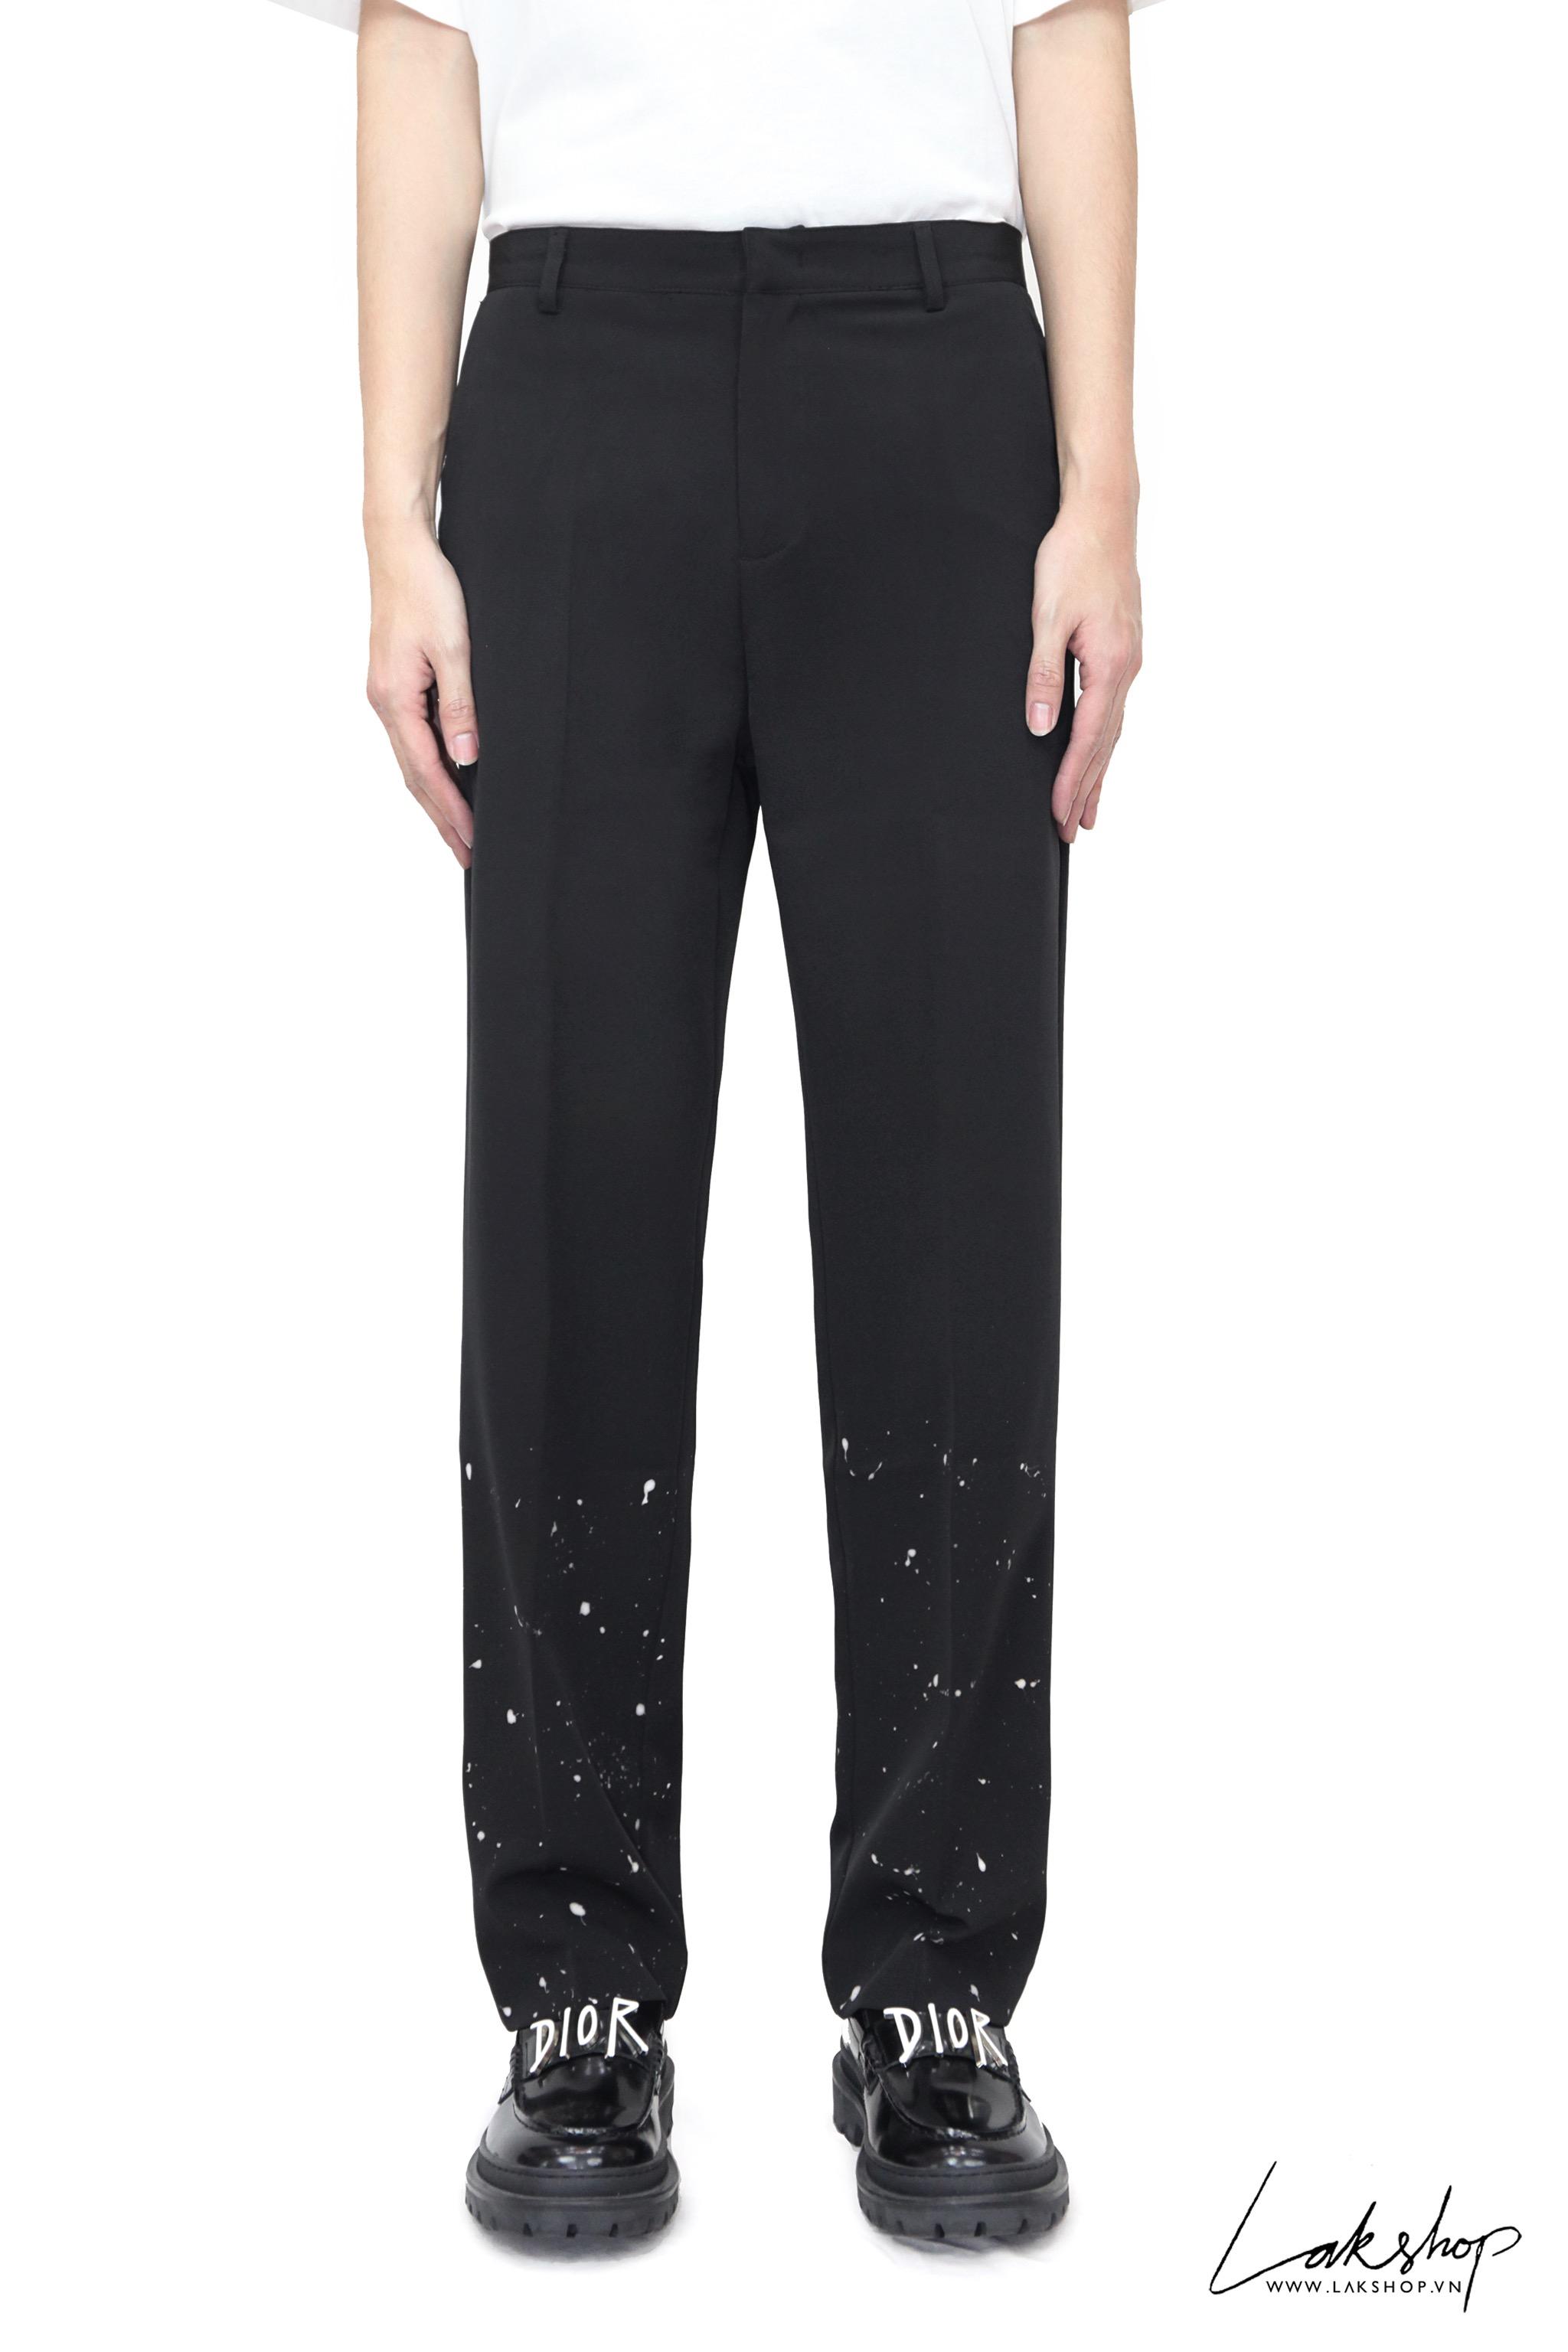 LakStudios Baroque Horse Begie Slik Shirt